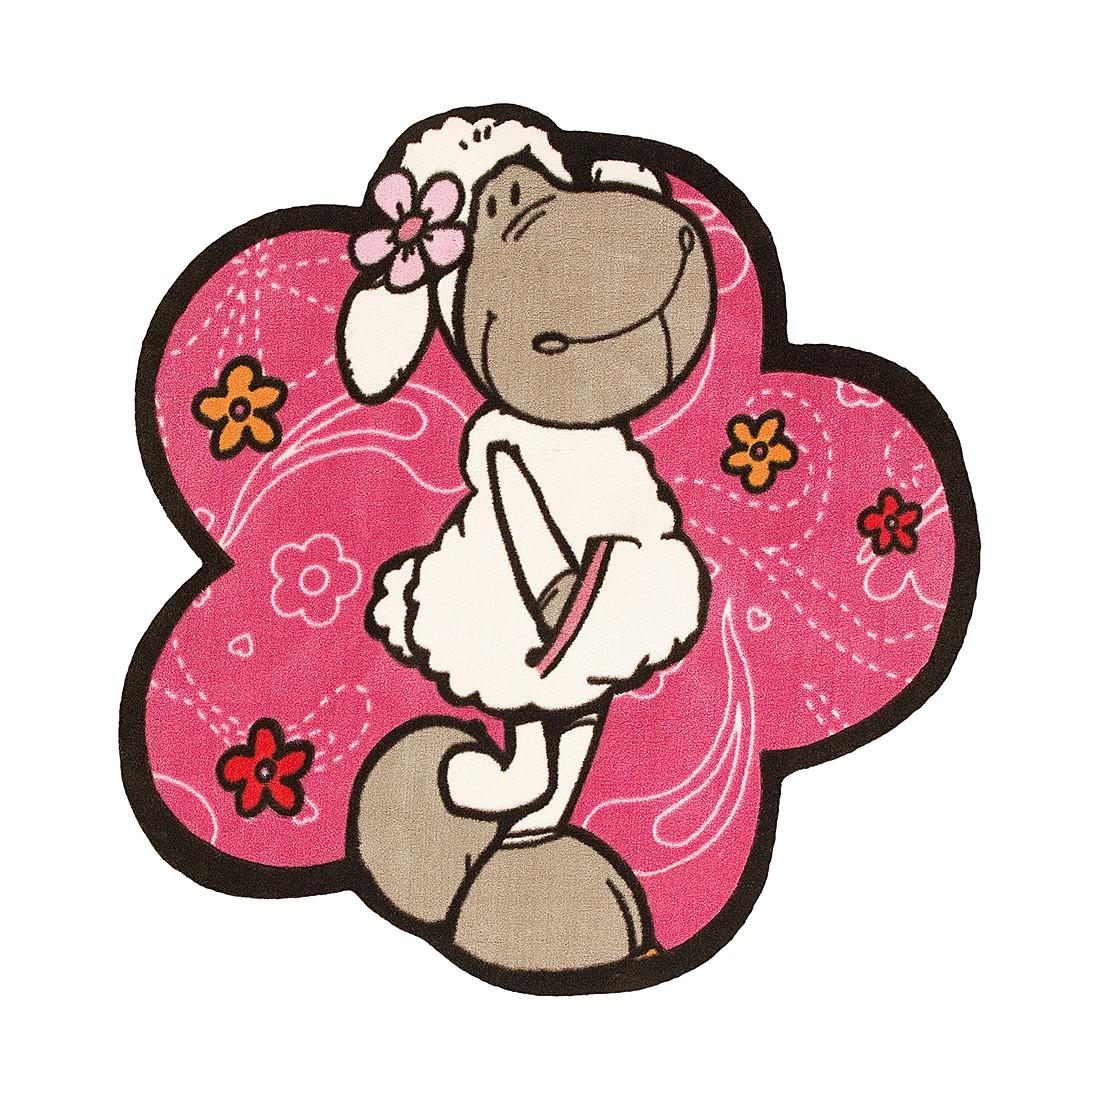 Teppich Jolly Rosa - Rosa, Nici